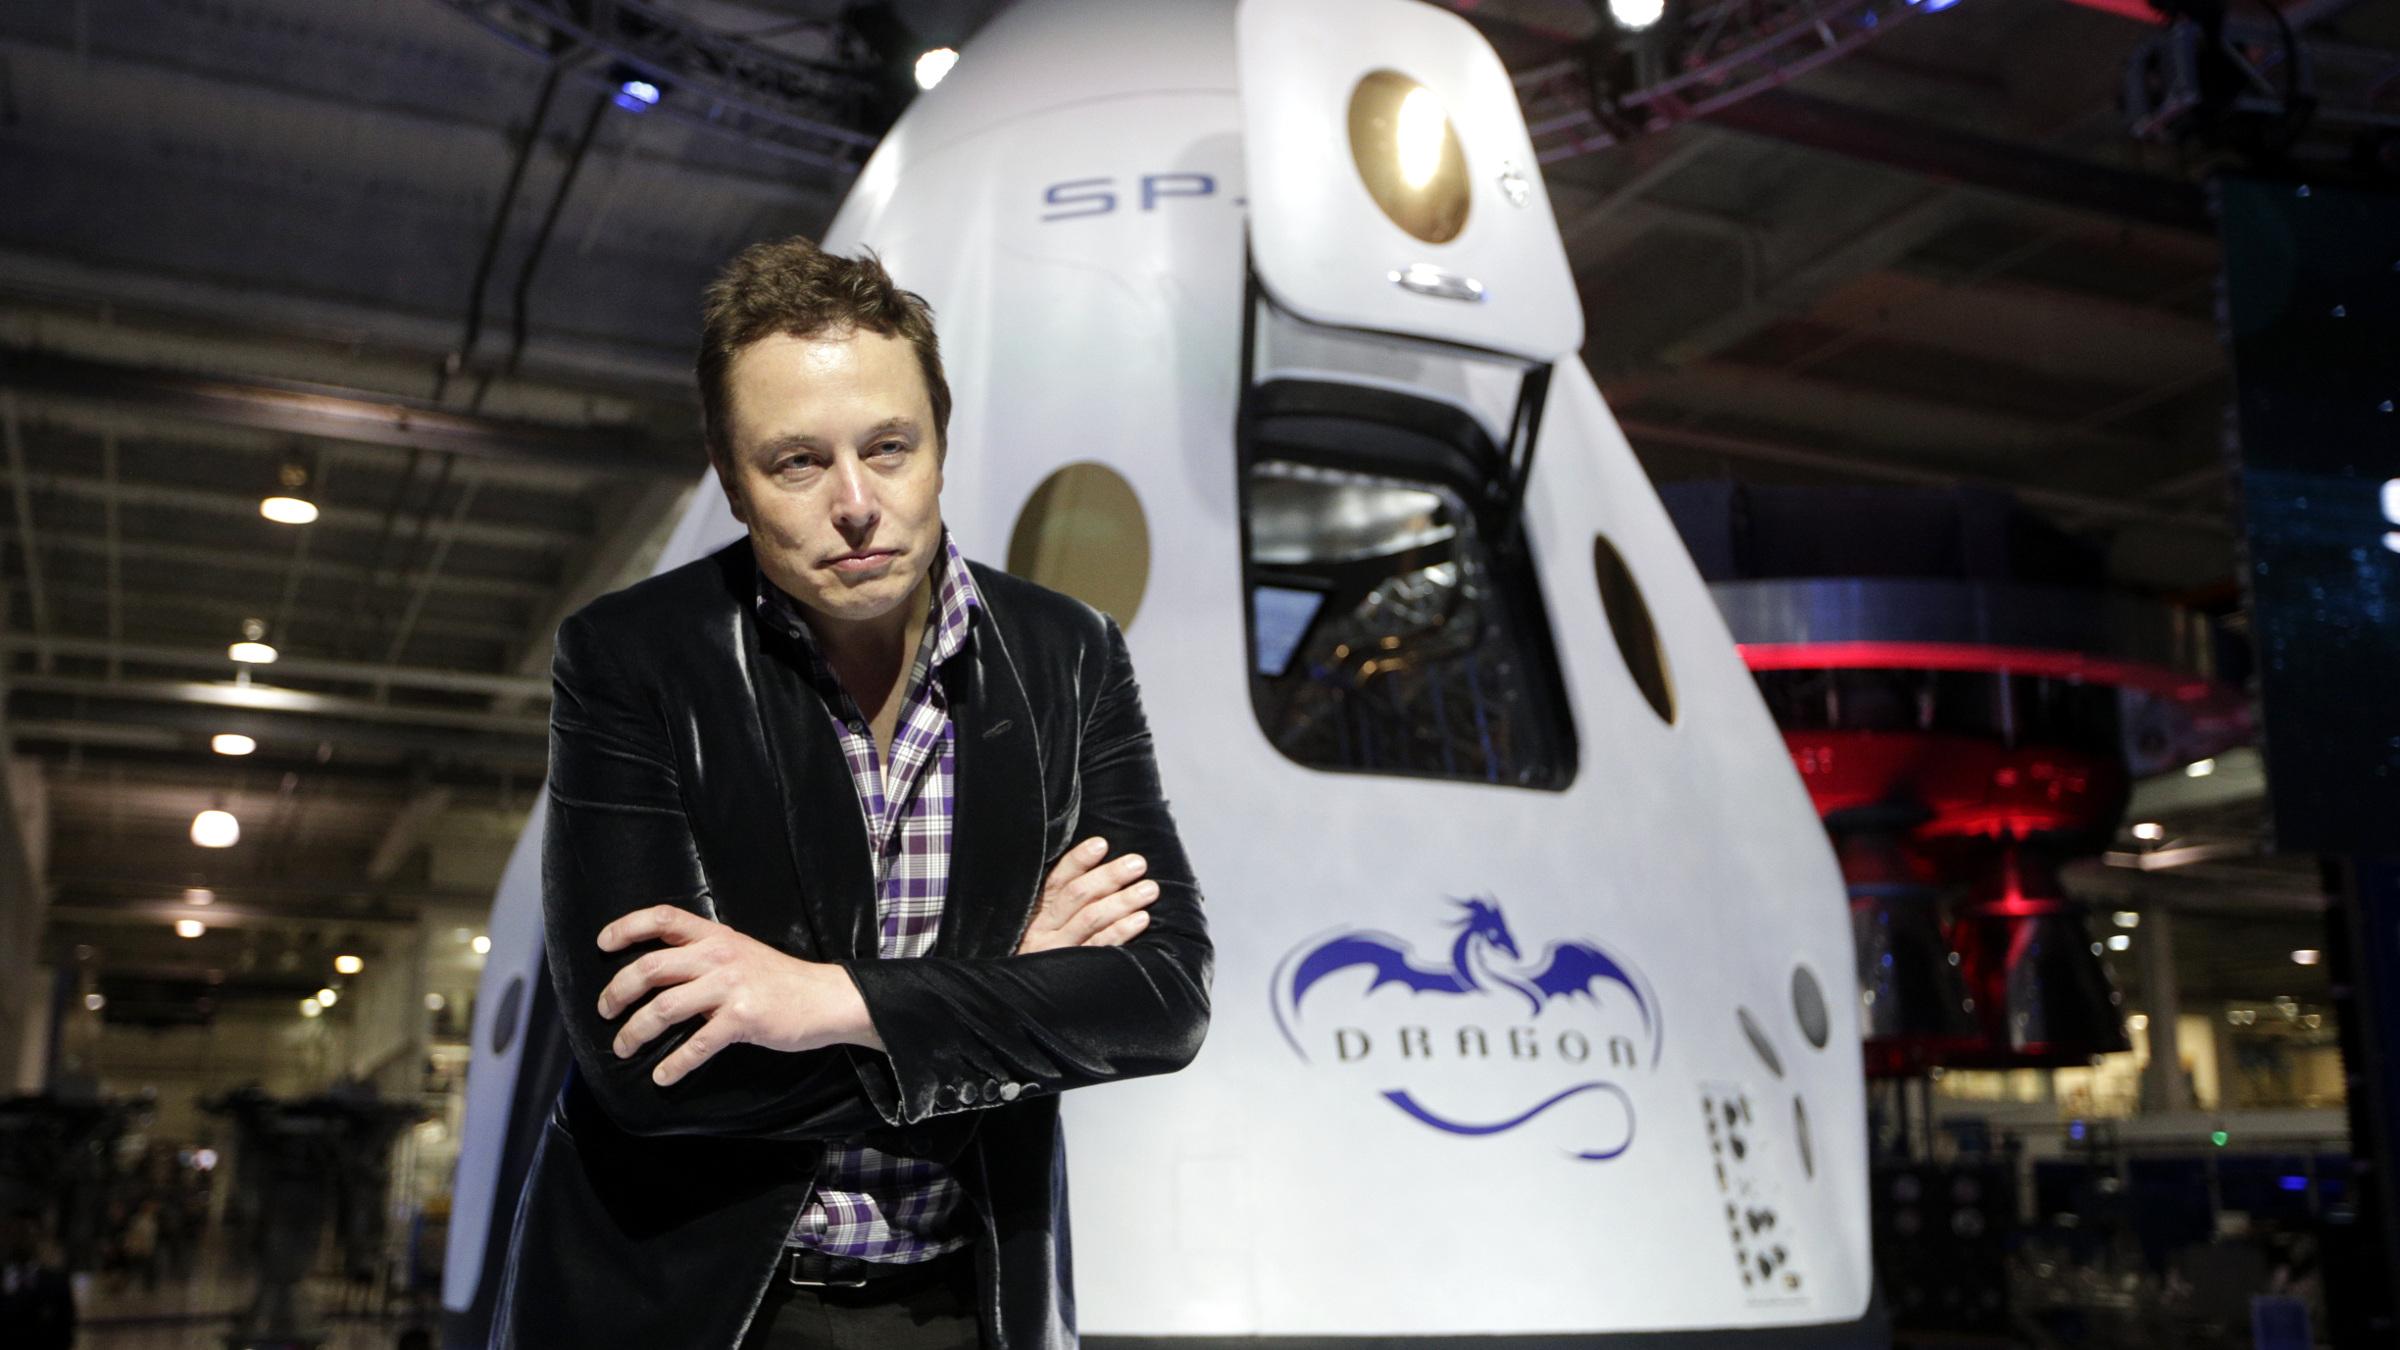 Jokowi ajak Elon Musk untuk bekerjsama dengan Indonesia. Seperti dilansir Detik.com, belum lama ini dia baru saja ngobrol lewat telpon bareng Elon Musk.